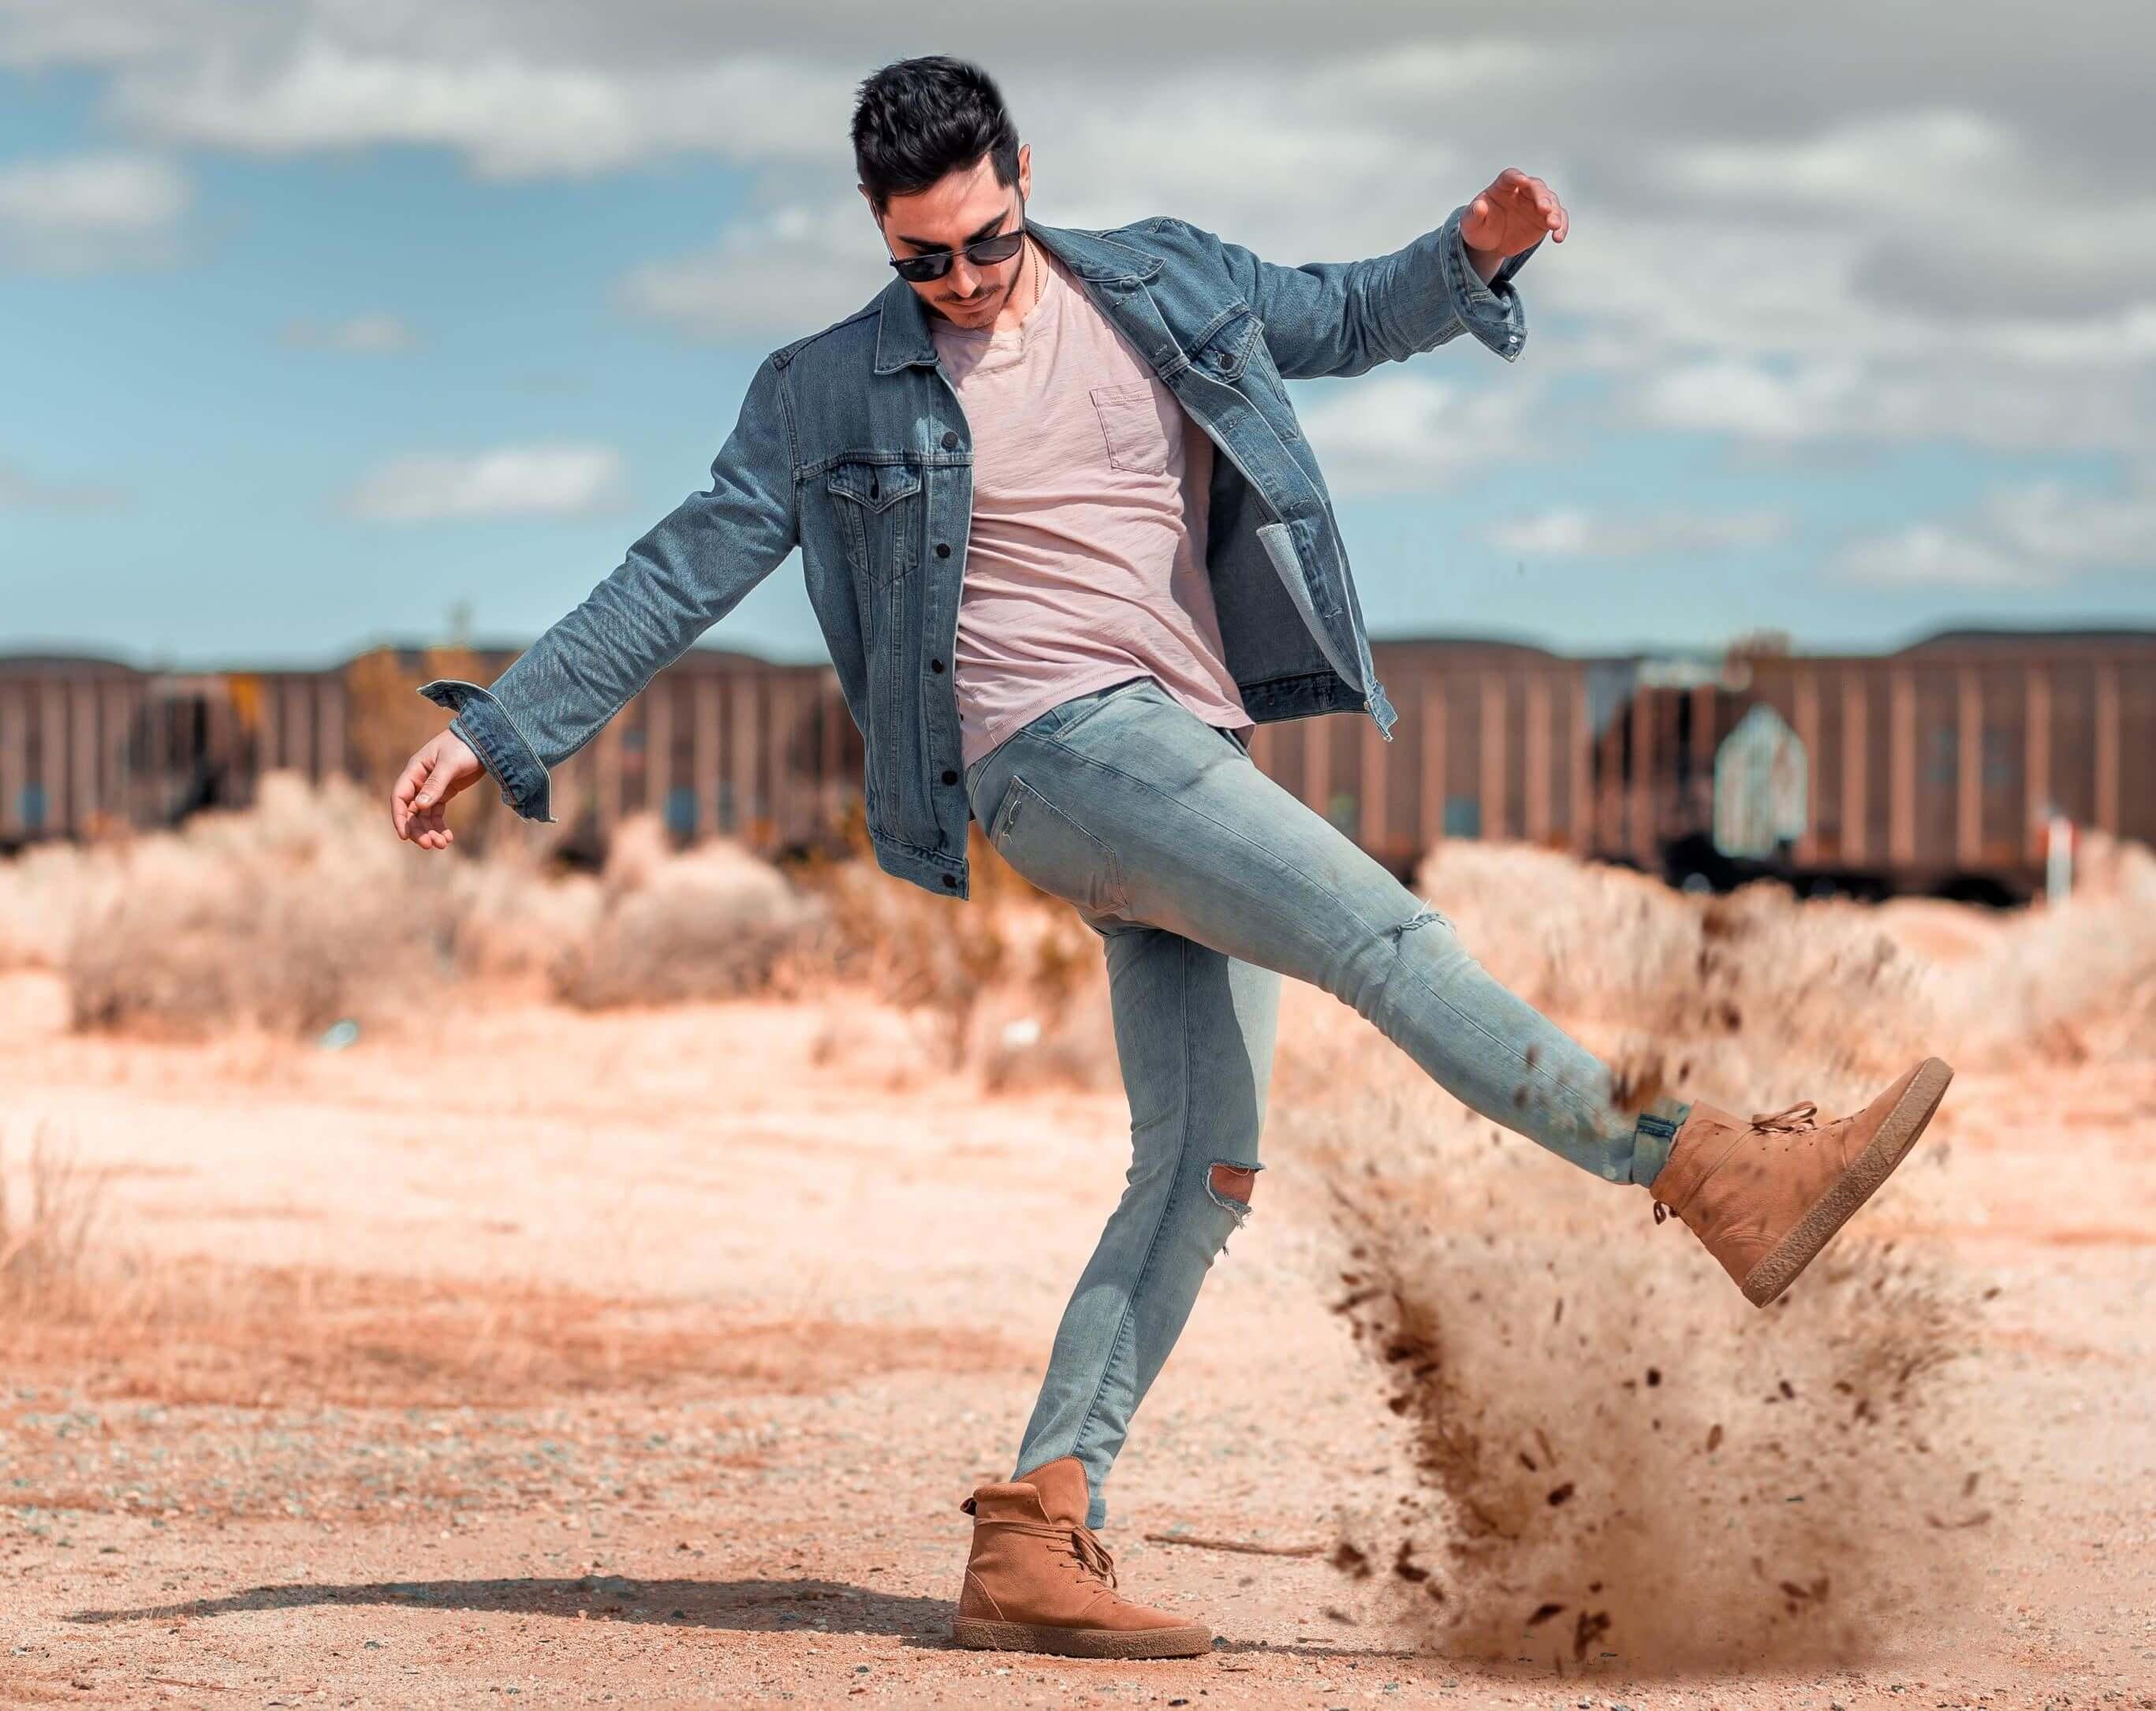 fac658d4f ... ESTILO DE VIDA · NEGÓCIOS · sapato masculino casual